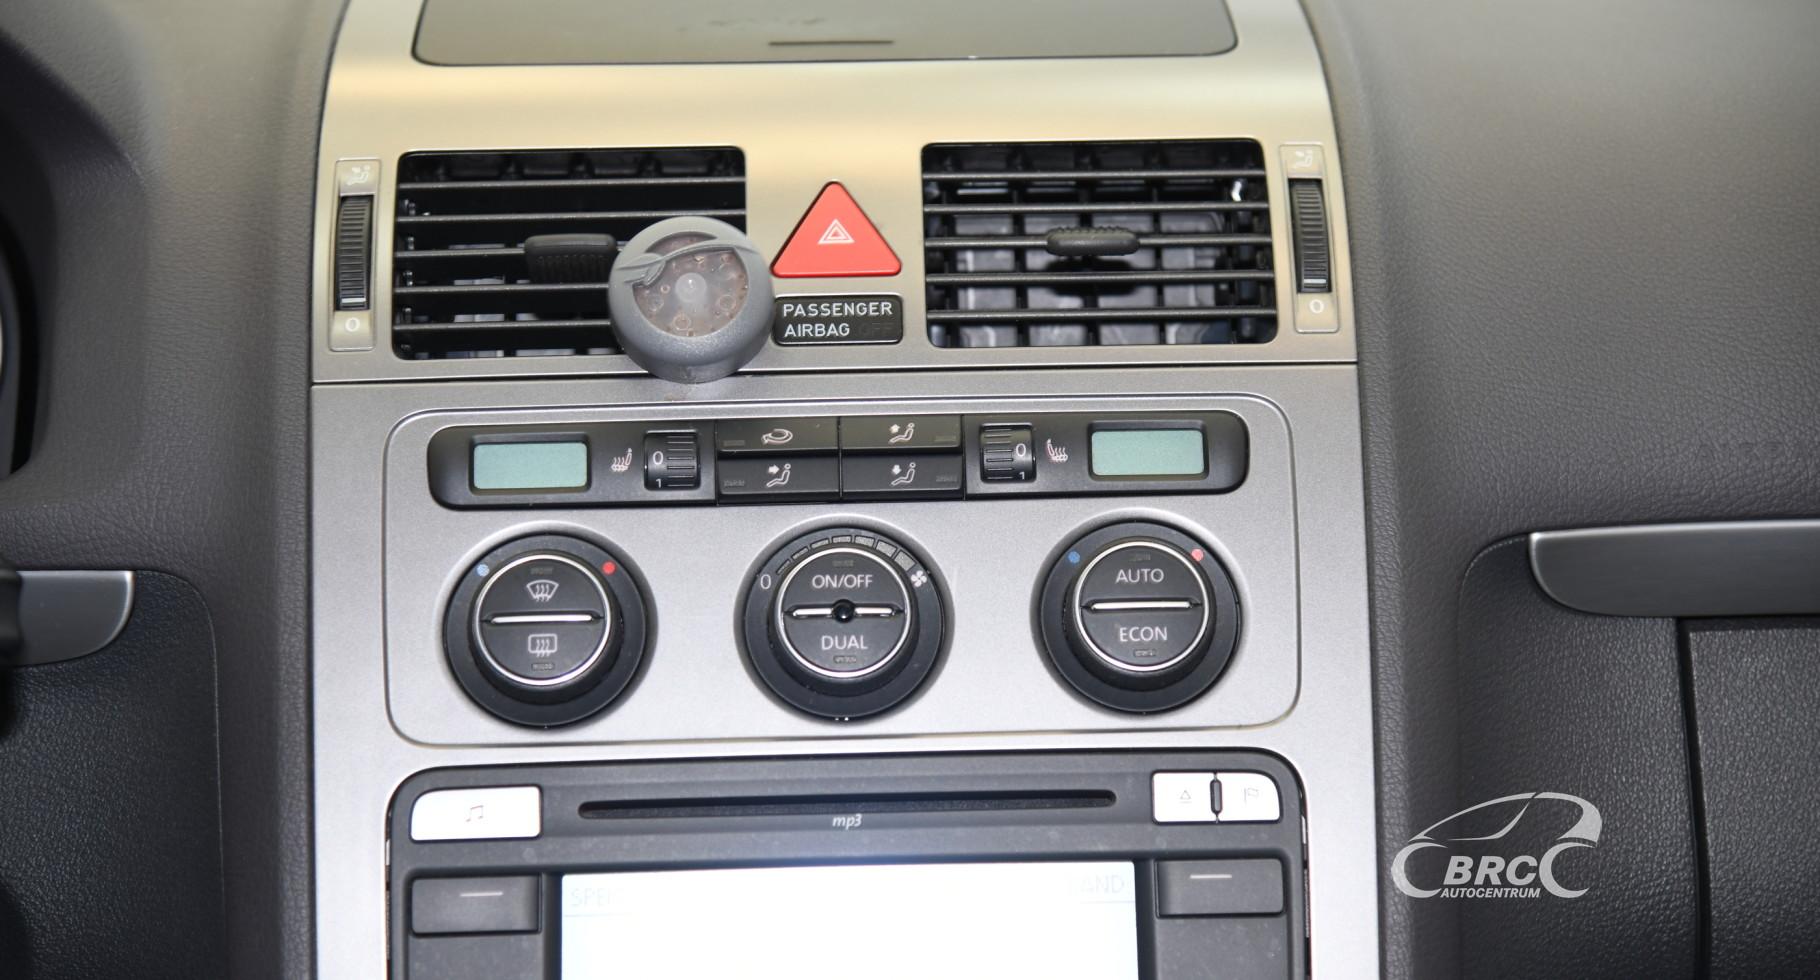 Volkswagen Touran 1.4 TSI DSG Automatas